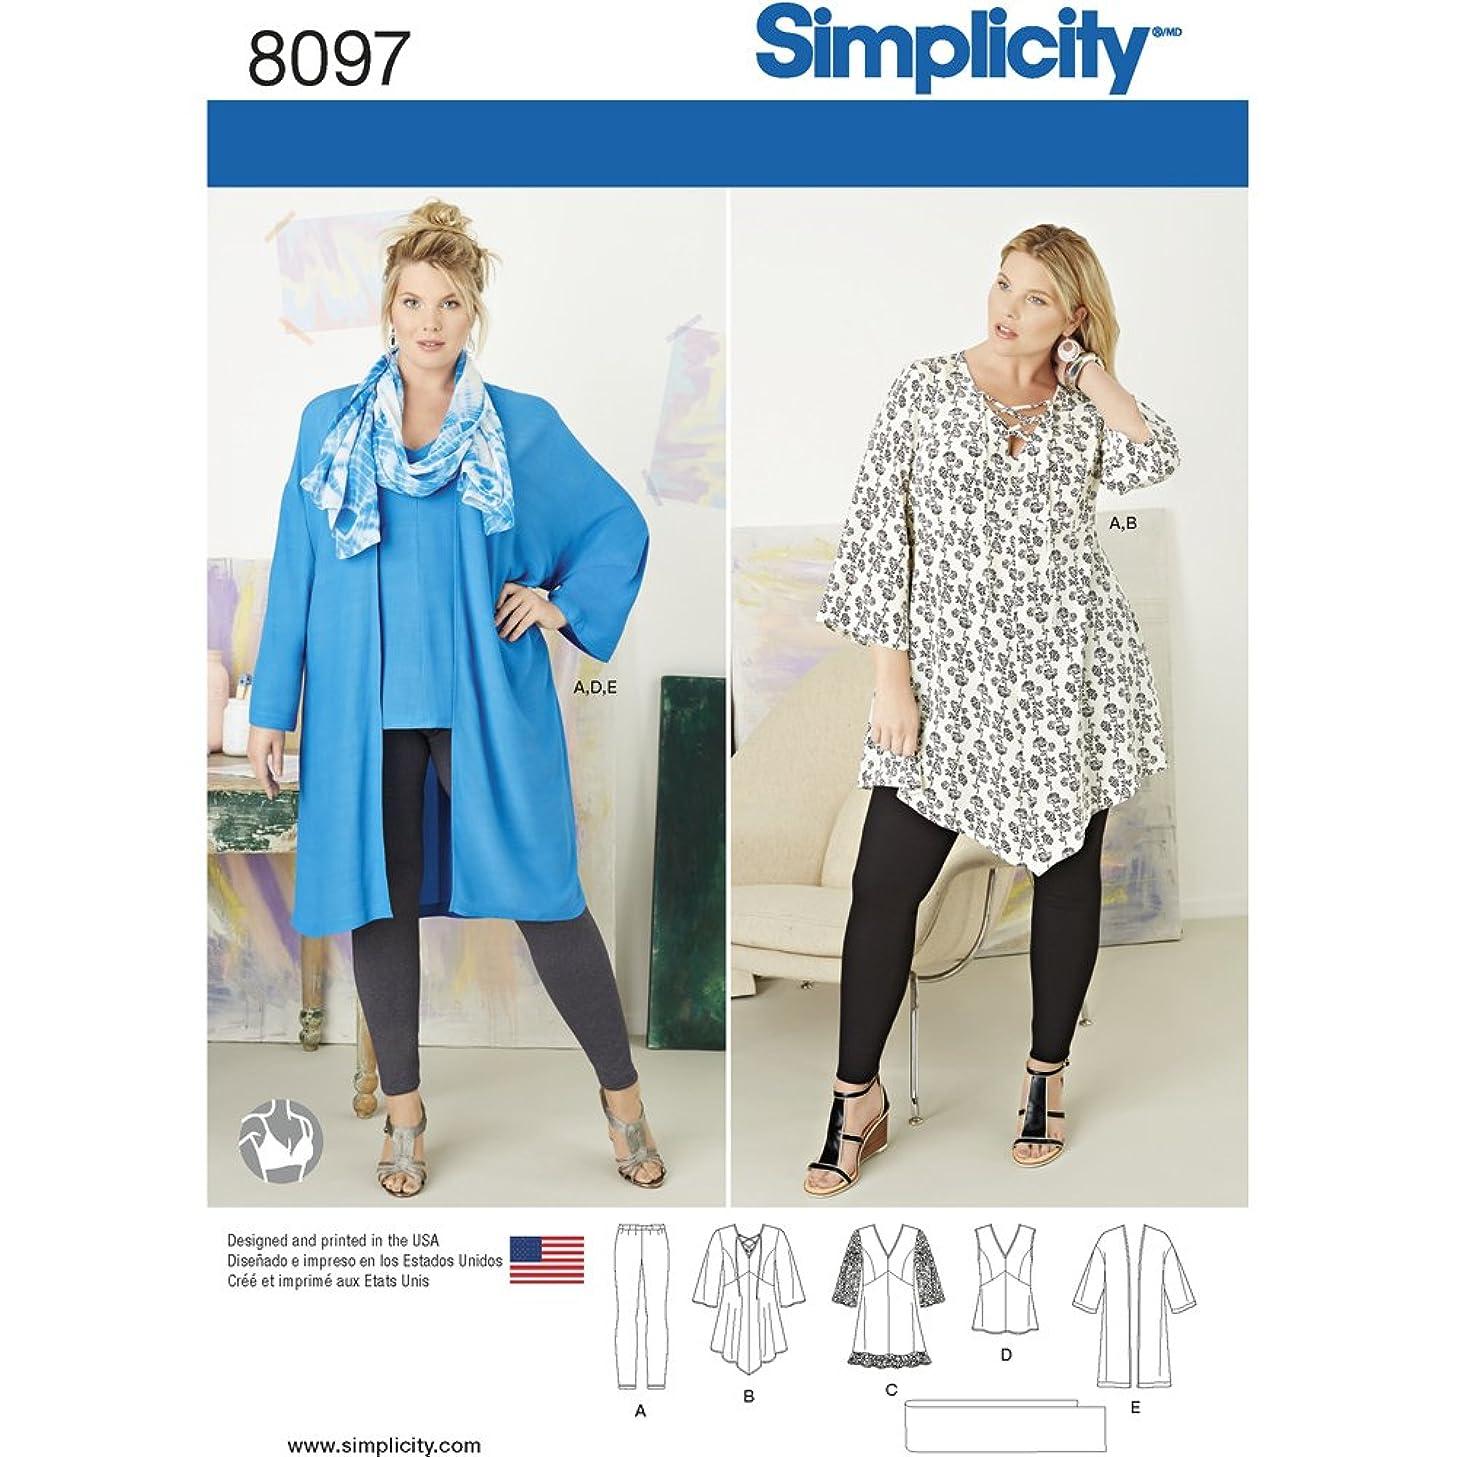 Simplicity Creative Patterns US8097GG Plus Size Tunic, Top, Kimono and Knit Leggings, Size GG (26W-28W-30W-32W) cqoggn1515908